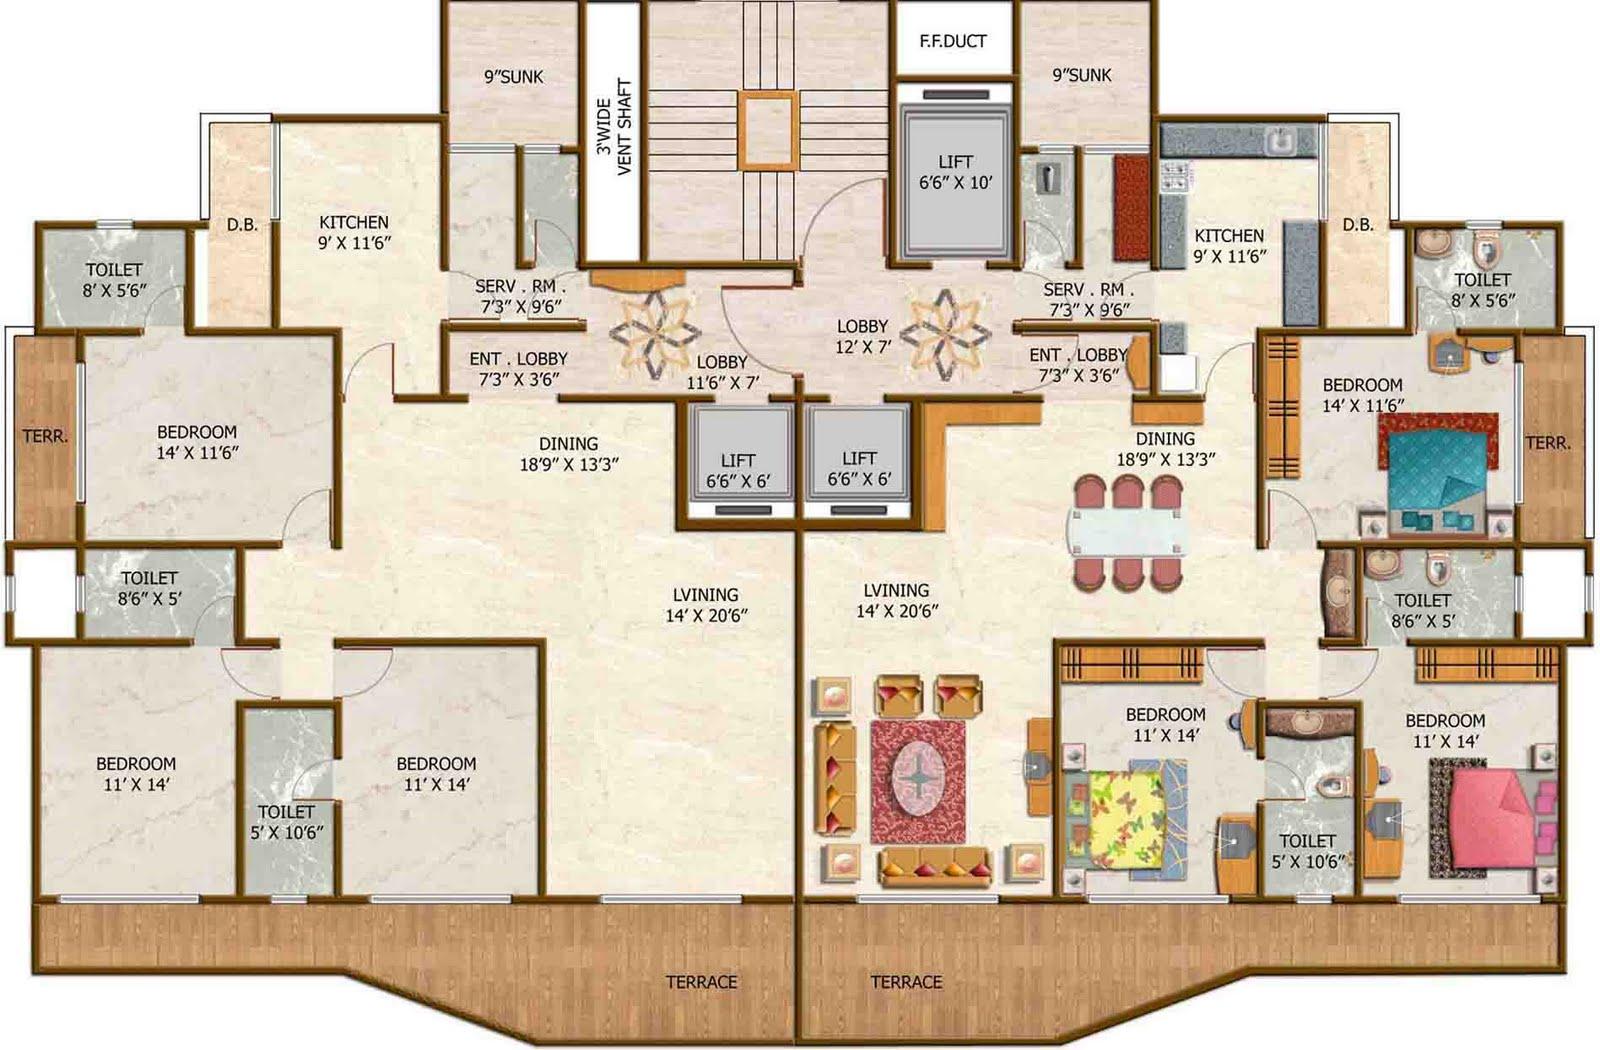 http://2.bp.blogspot.com/_mgEjkjcW2zQ/S_1GcEPOvTI/AAAAAAAACfk/bXeloV0O-8c/s1600/Floor+Plan.jpg